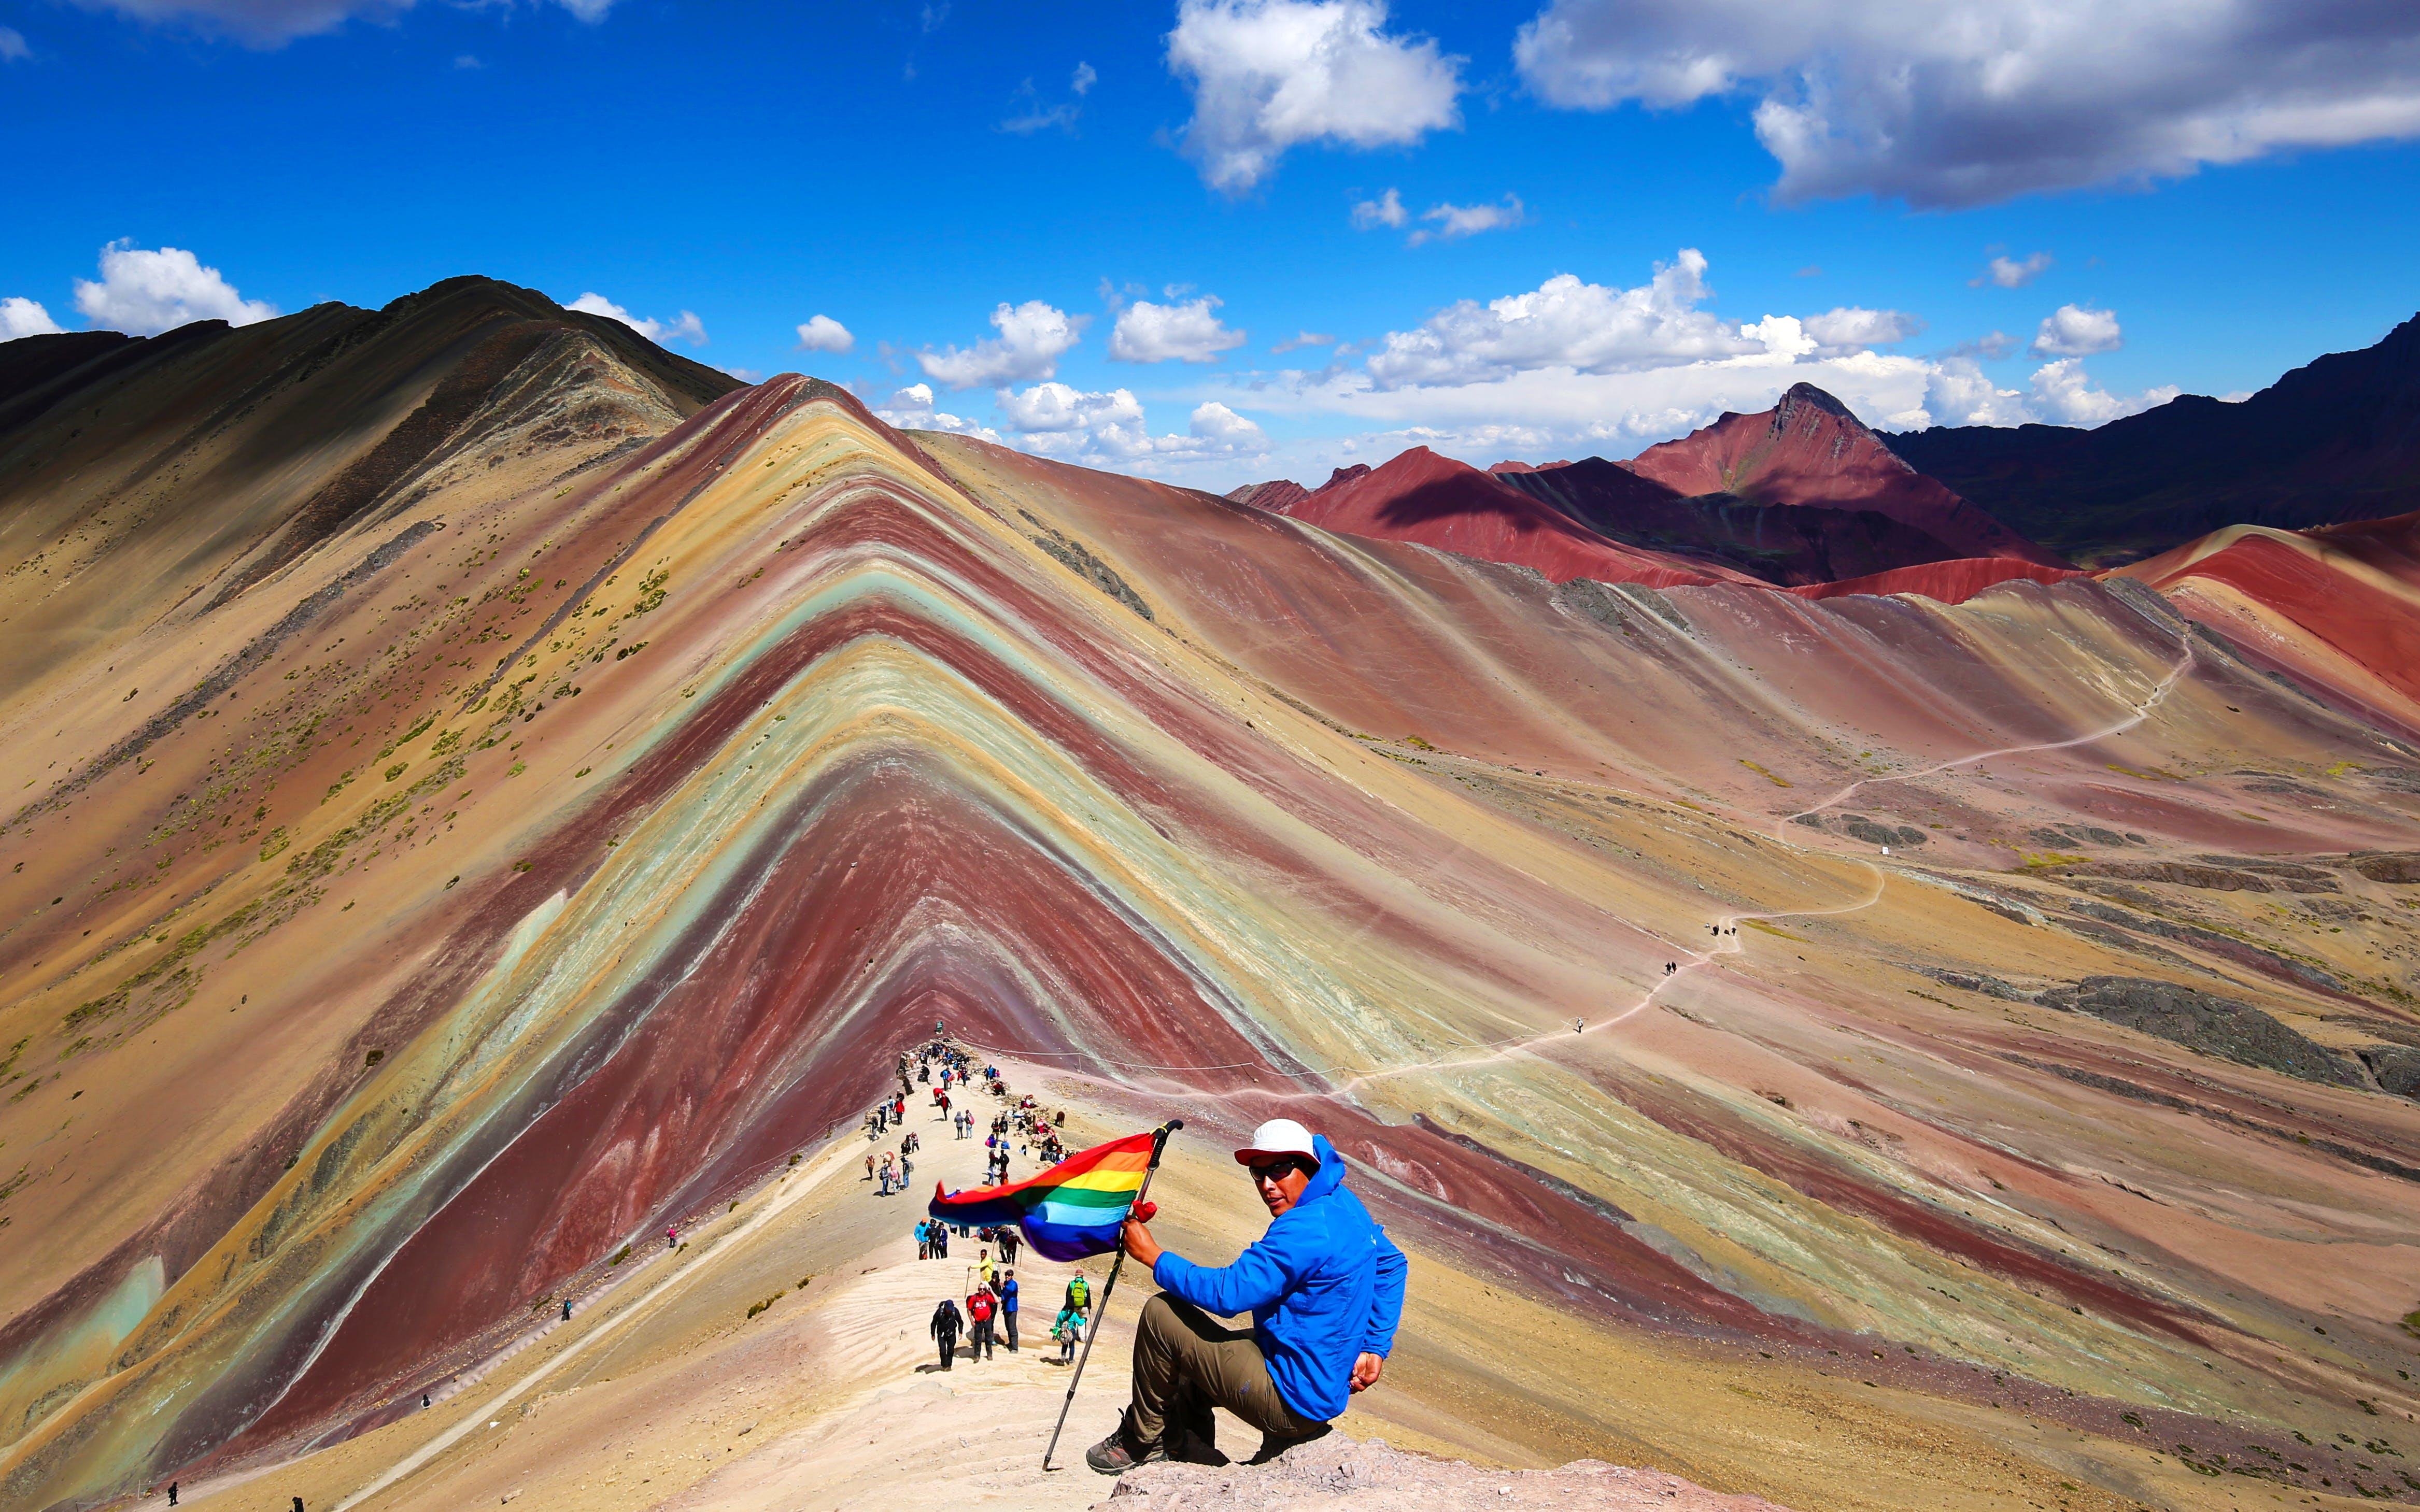 10-Day Ausantage, Rainbow Mountain & Machu Picchu